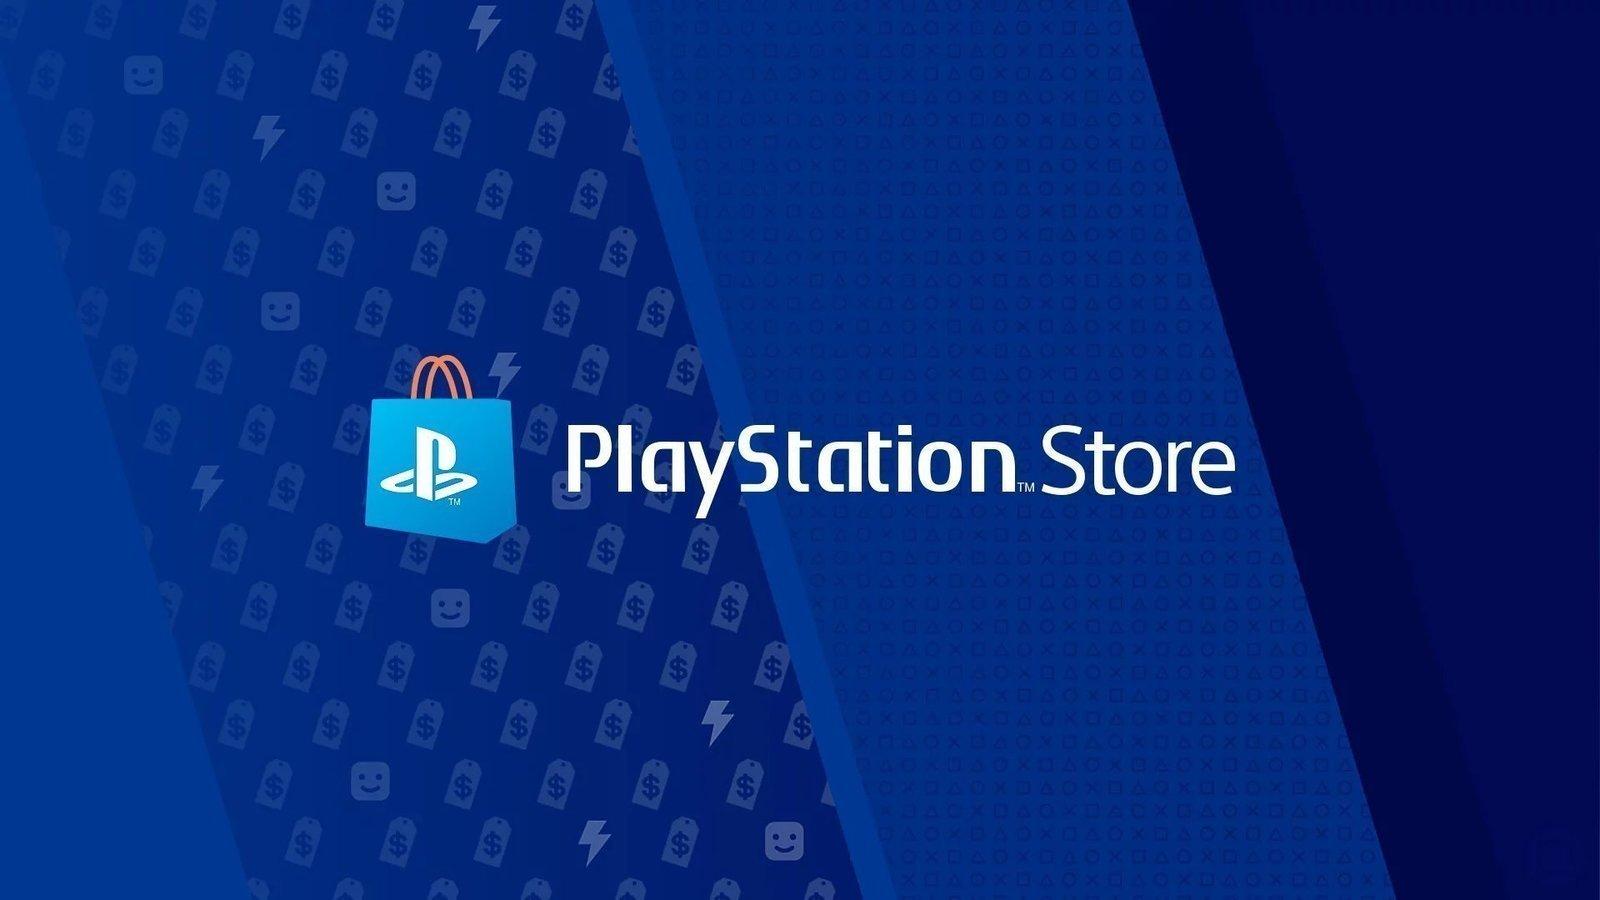 PlayStation Store mega mart indirimleri